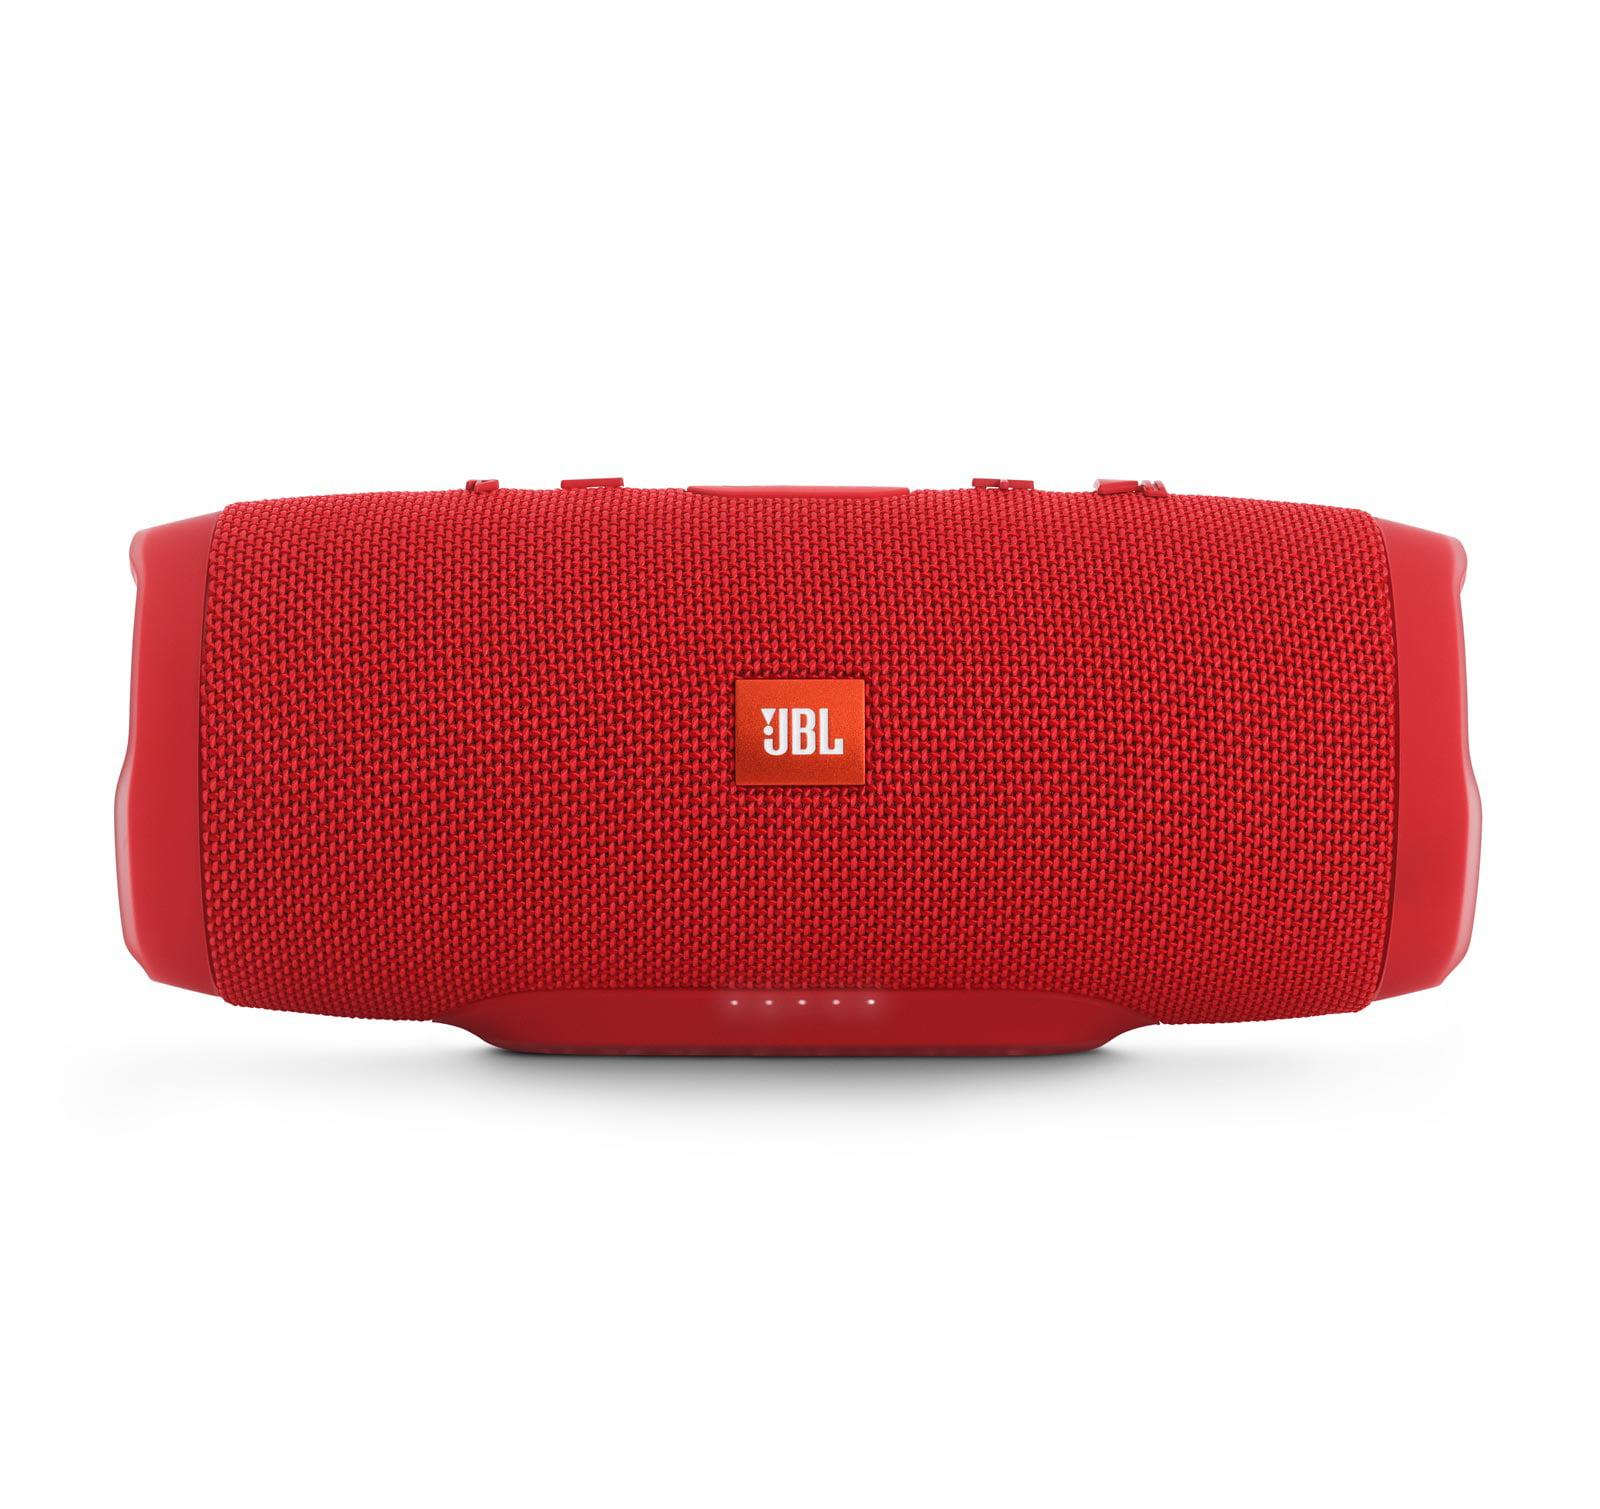 JBL Charge 3 Red Open Box Waterproof Portable Bluetooth Speaker by JBL